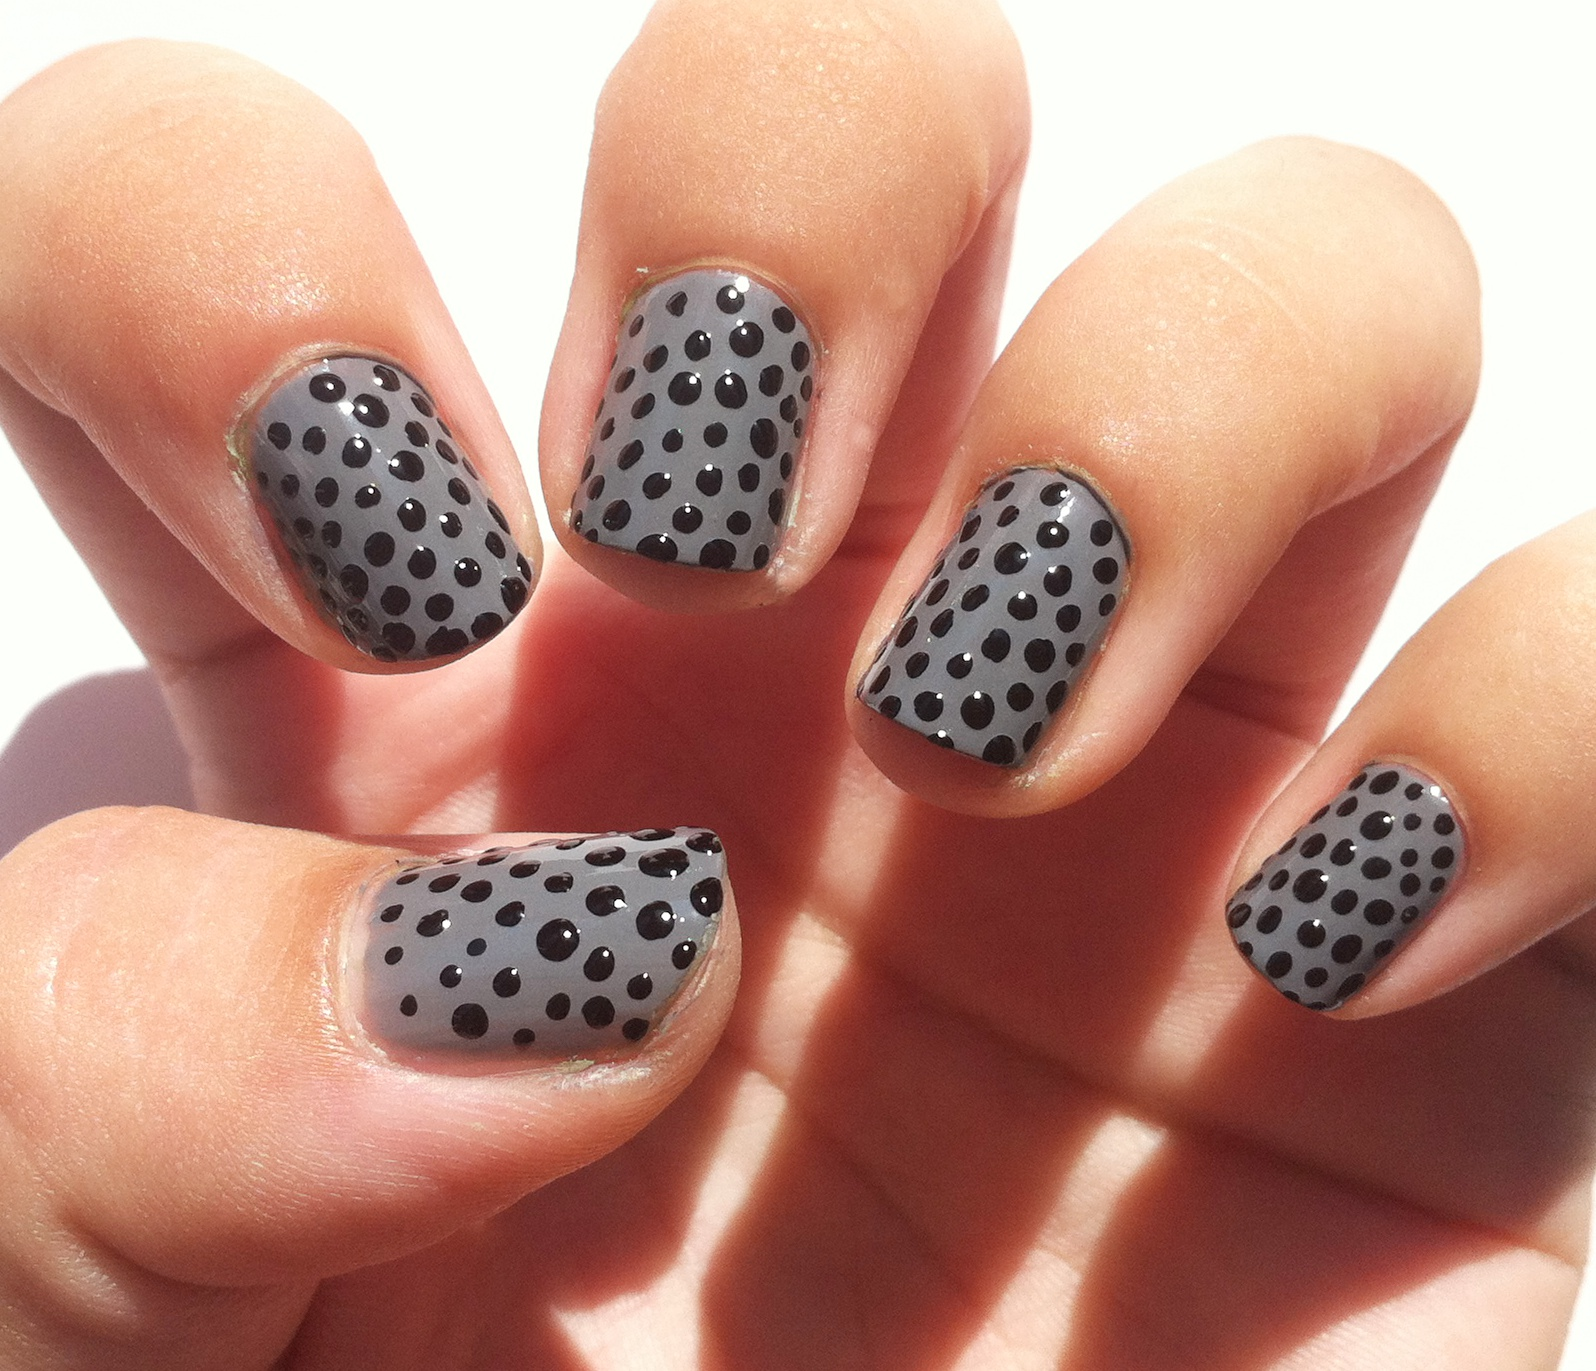 Nail Design For Black : Black nail designs pccala